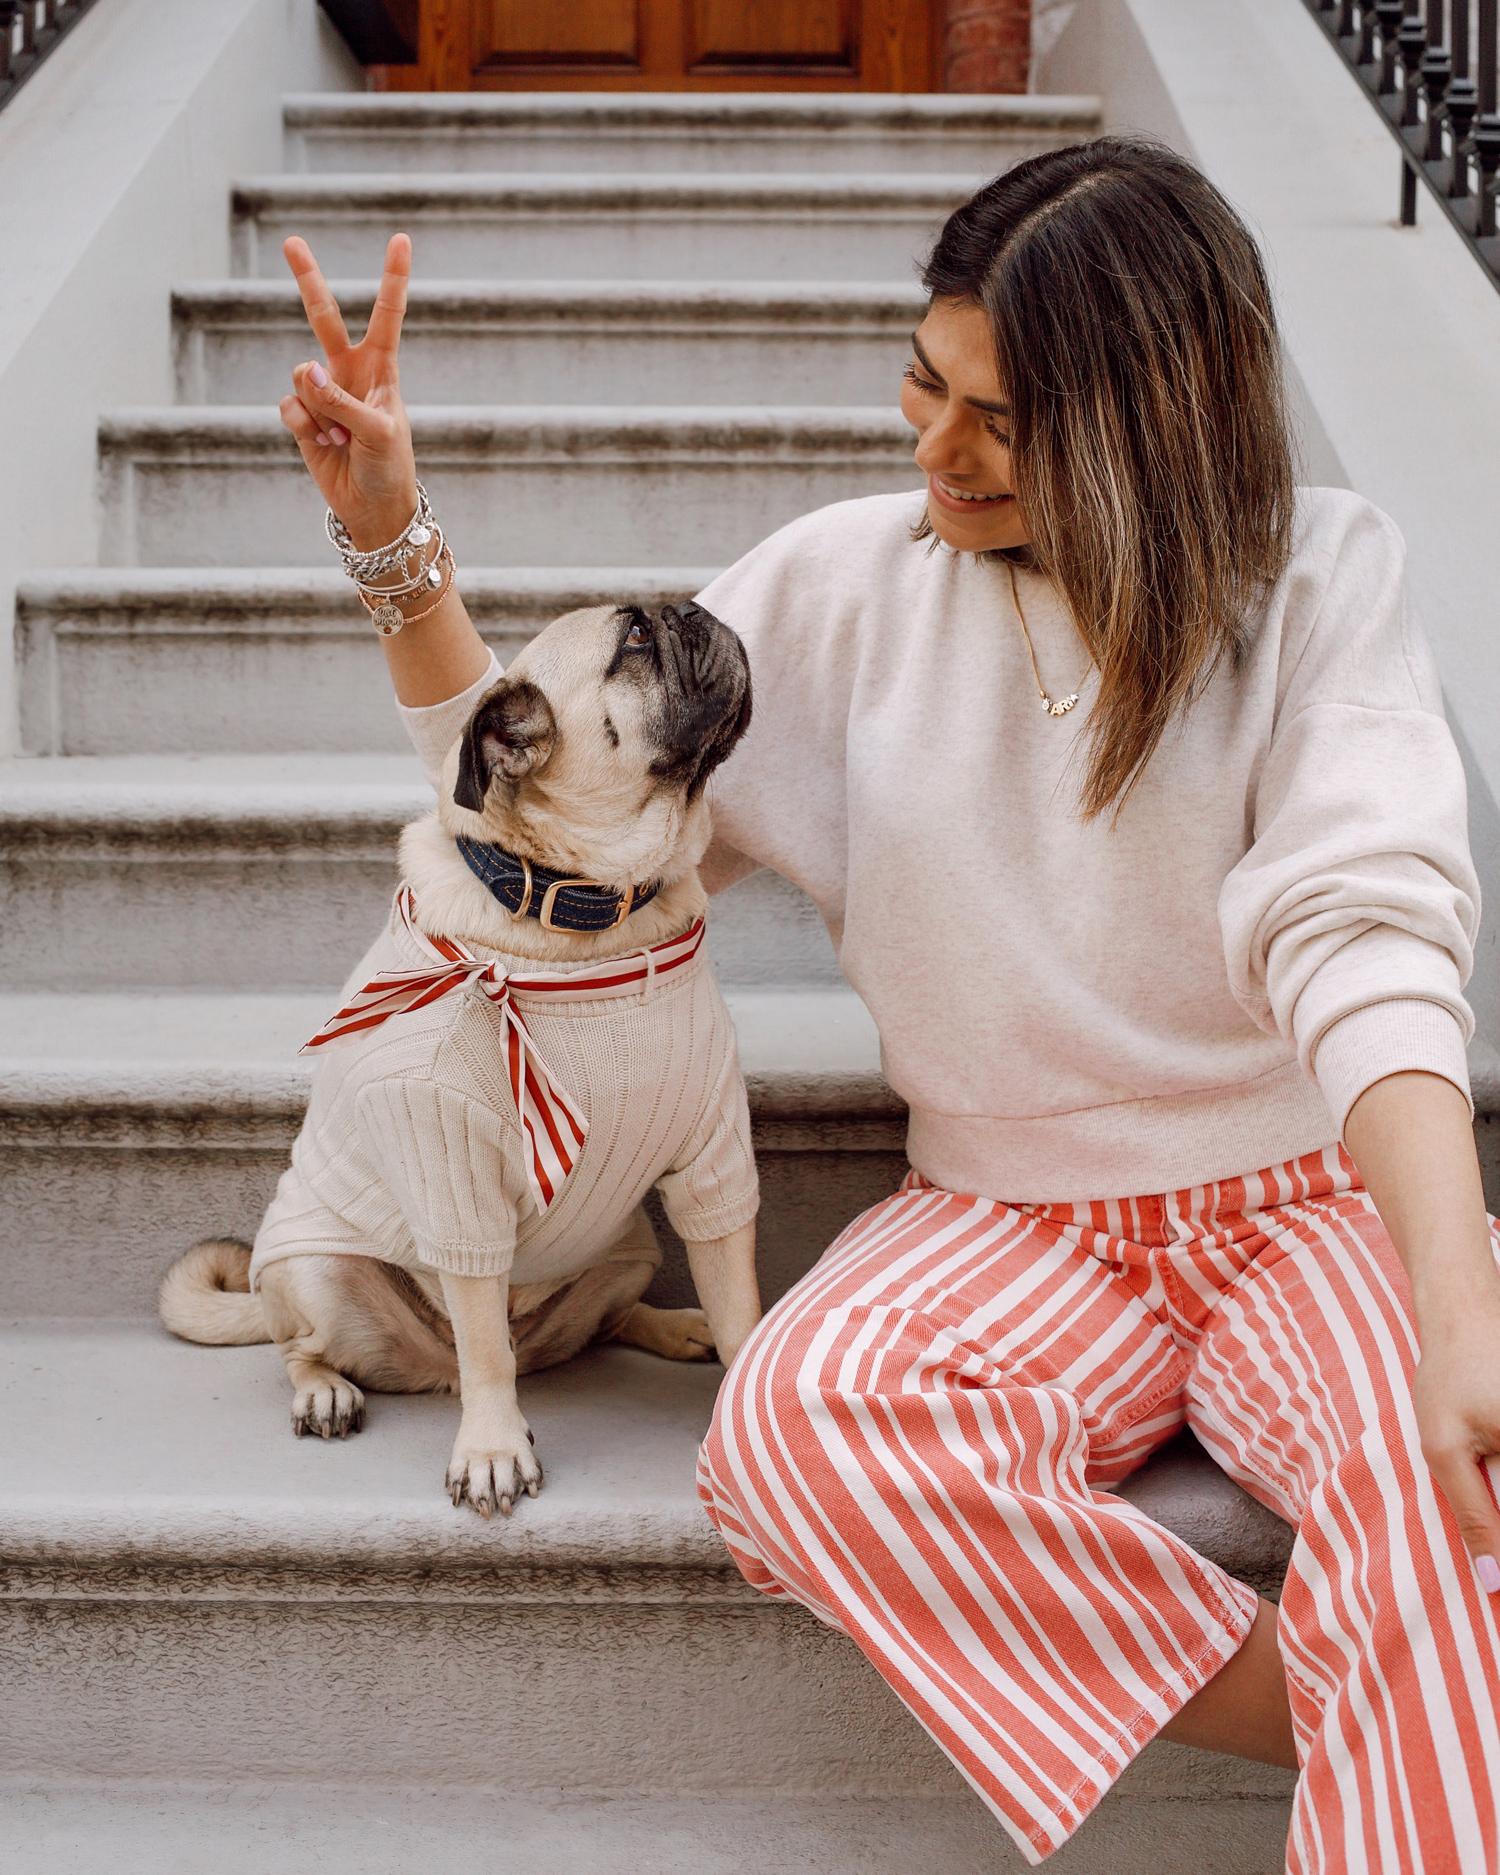 honeyidressedthepug-aleaandani-motherdaycampaign-dogmom-blog-mothersday2019-dogblog-newyorkdogs-nycdogmom-twinningwithmydog 9.jpg